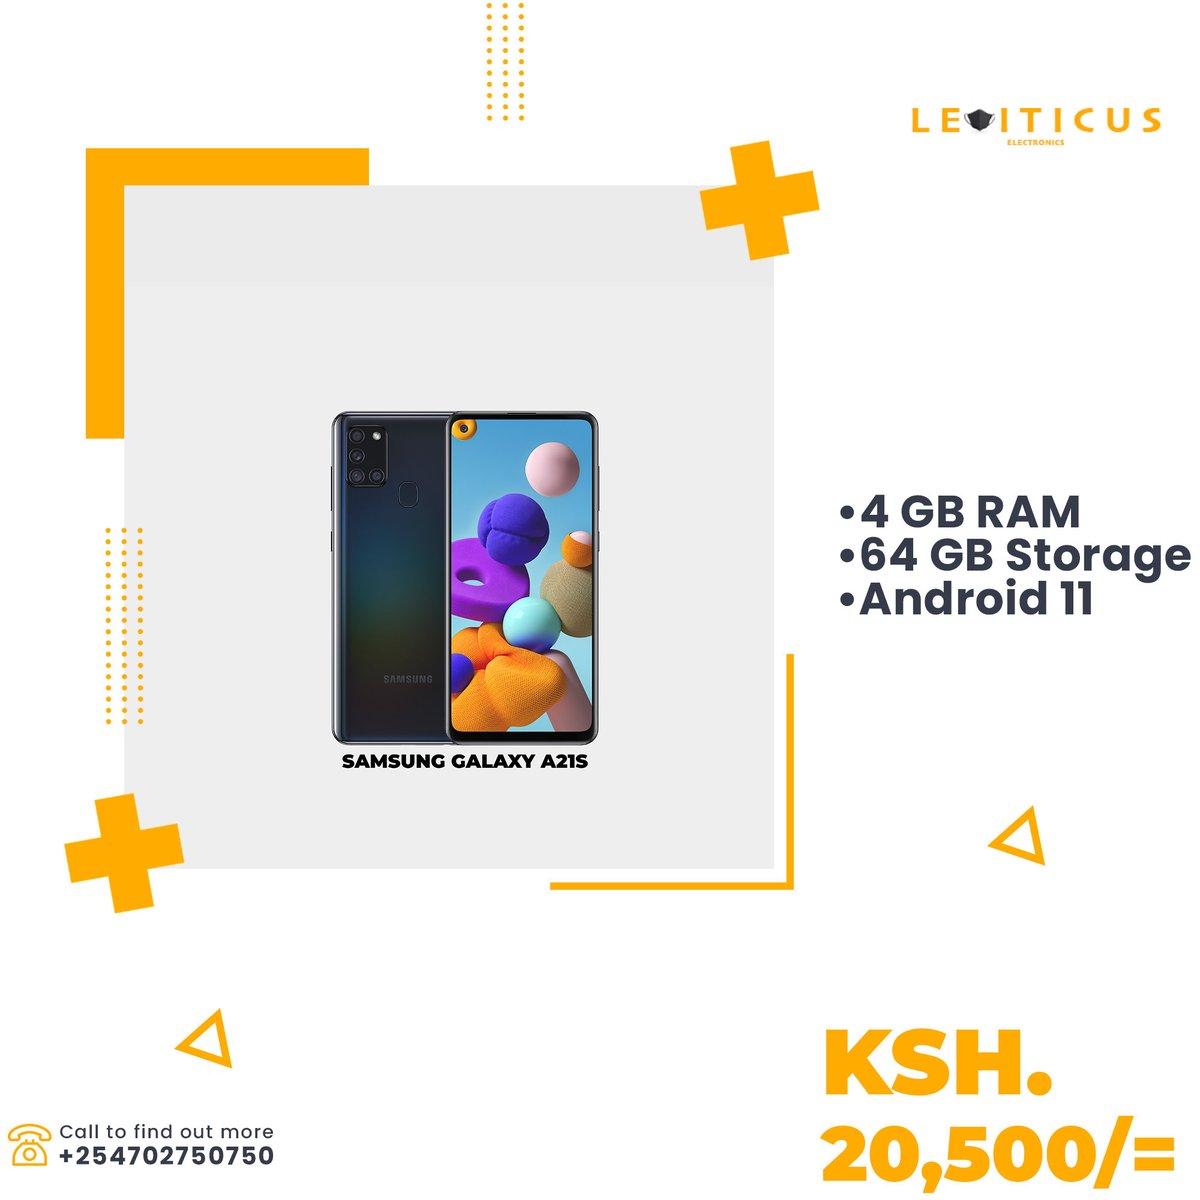 Samsung smartphones are available at amazing prices only at Leviticus Electronics. Get the Galaxy A21s at only Ksh.20500/=  #UkoraMahakamani #gainwithmchina #Paidpartnershipwithdiageo #LG100Club #IkoKaziKE #Tbt #Nairobi #technology #dealske #dealsinkenya https://t.co/Ks6P5SJkKp